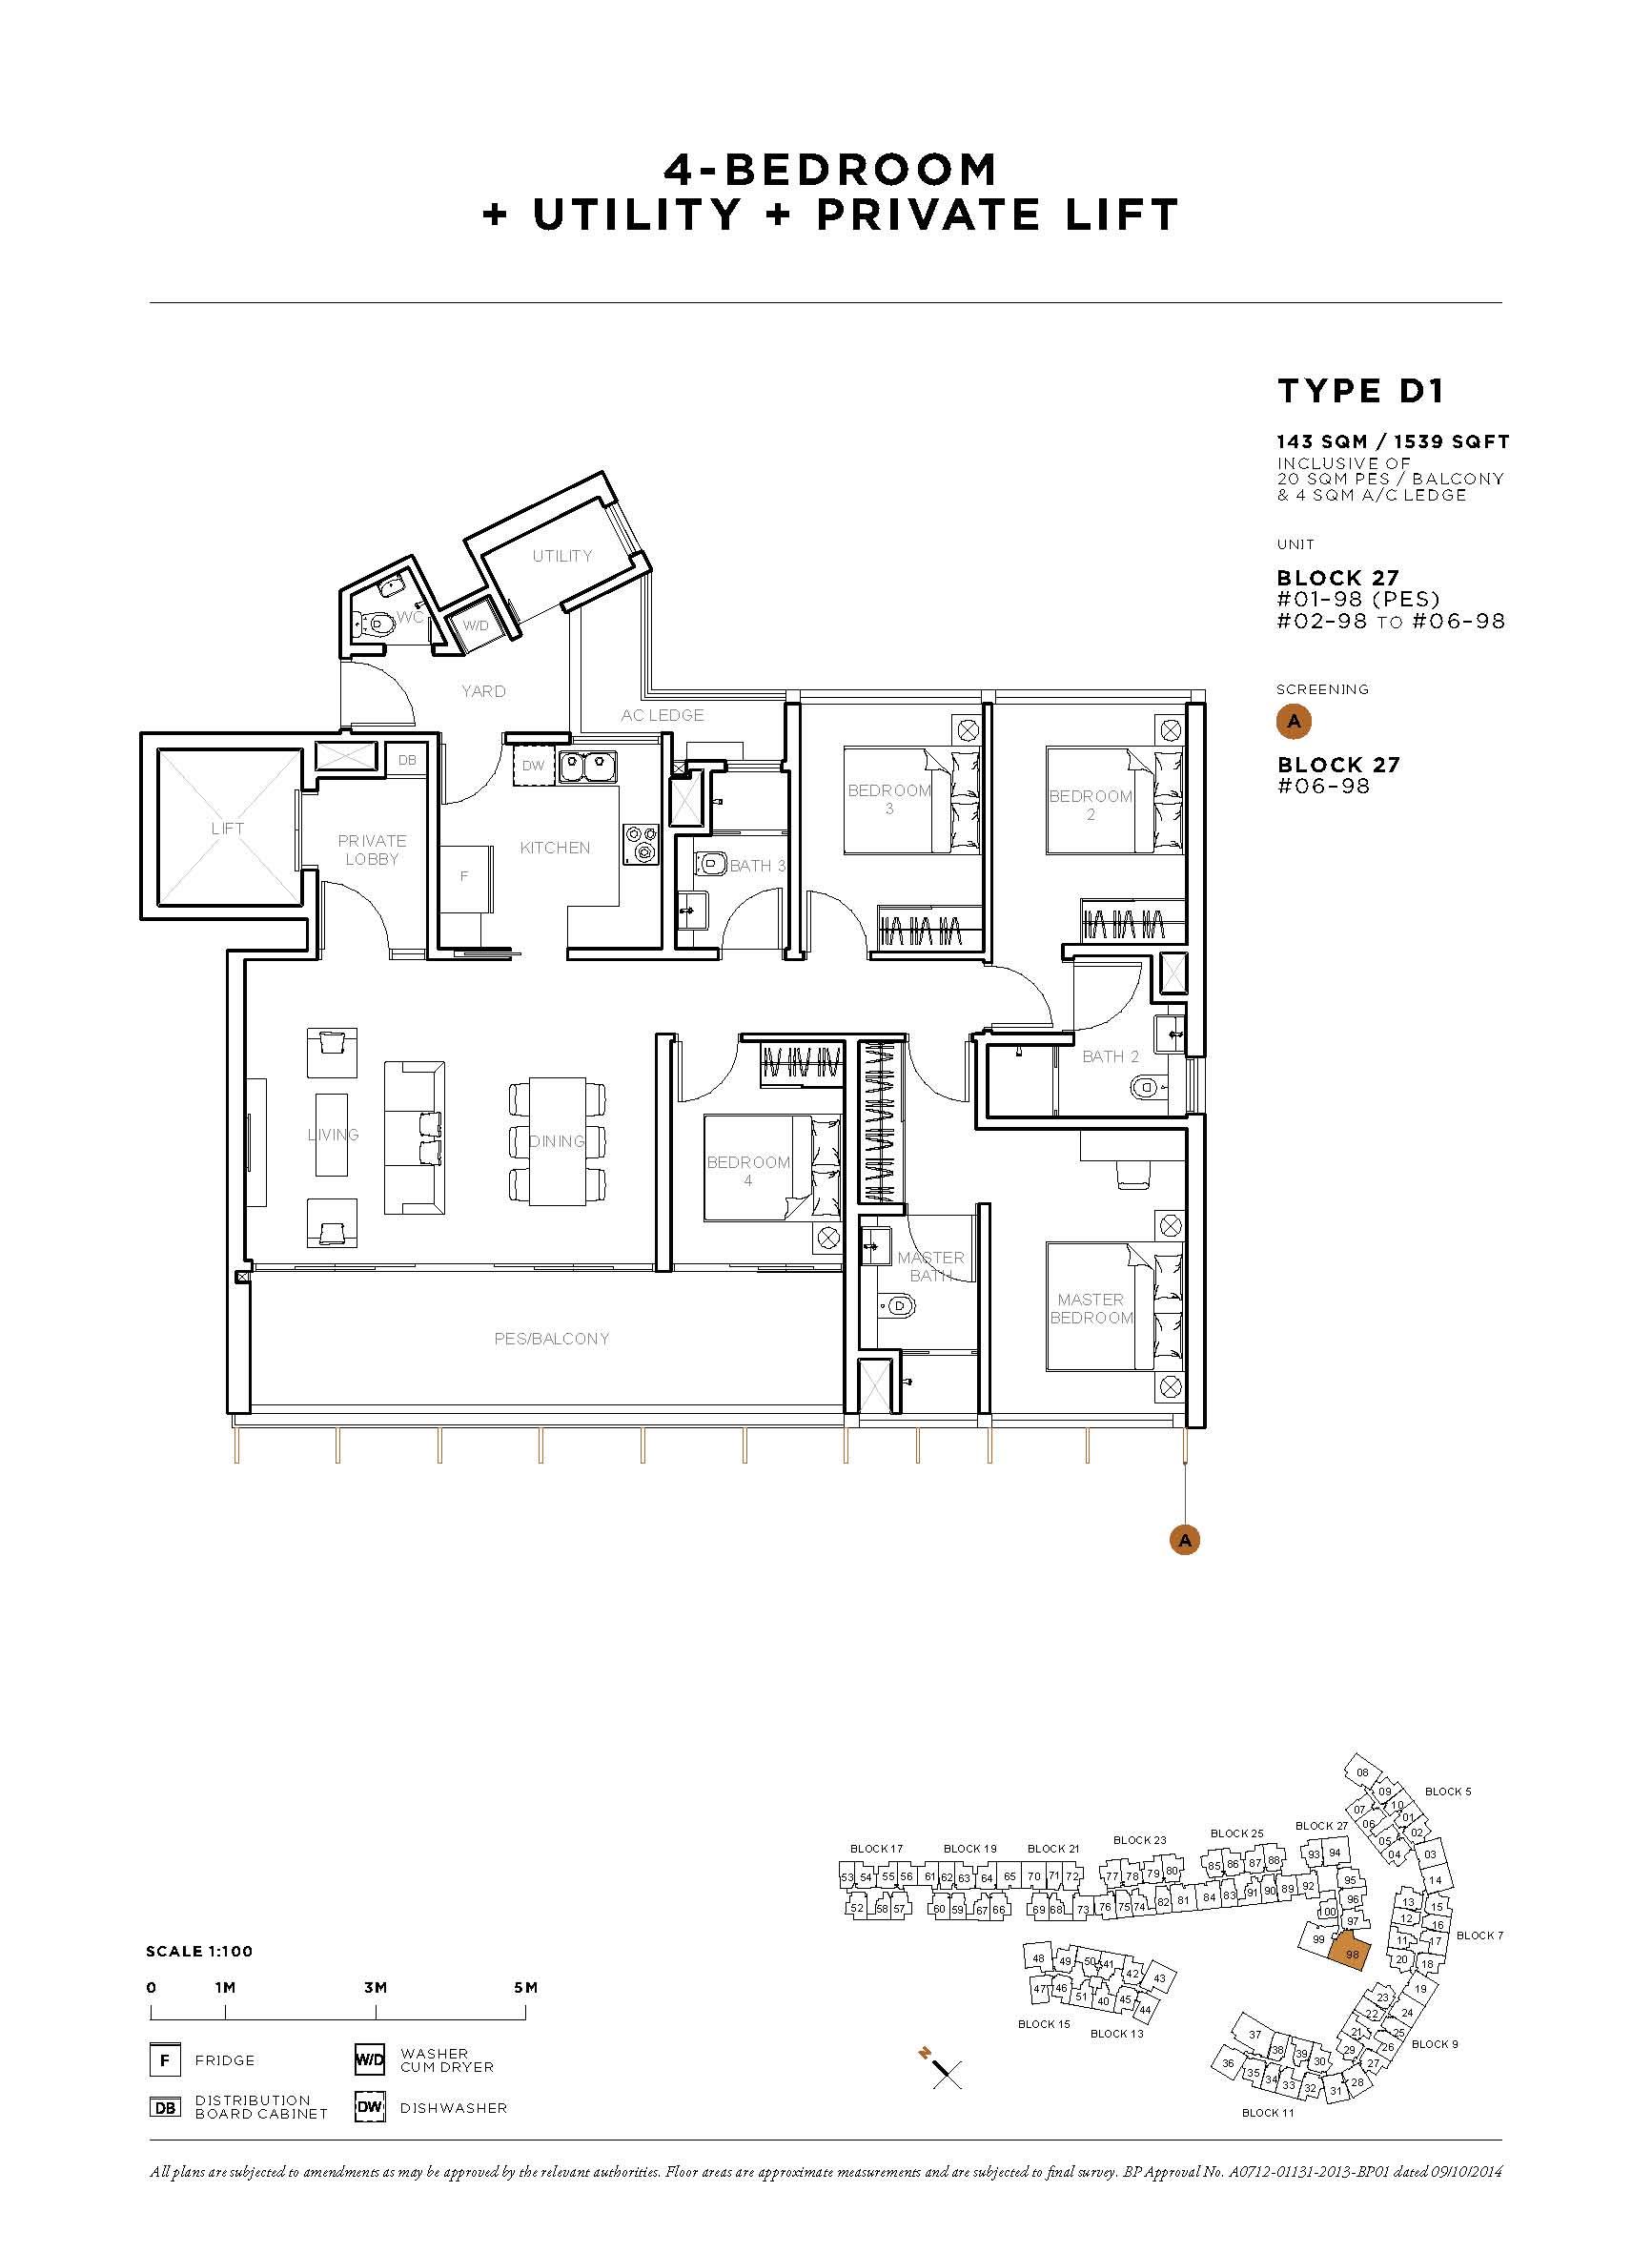 Sophia hills hottest selling district 9 why fr 1800psf for Kaplan floor plan